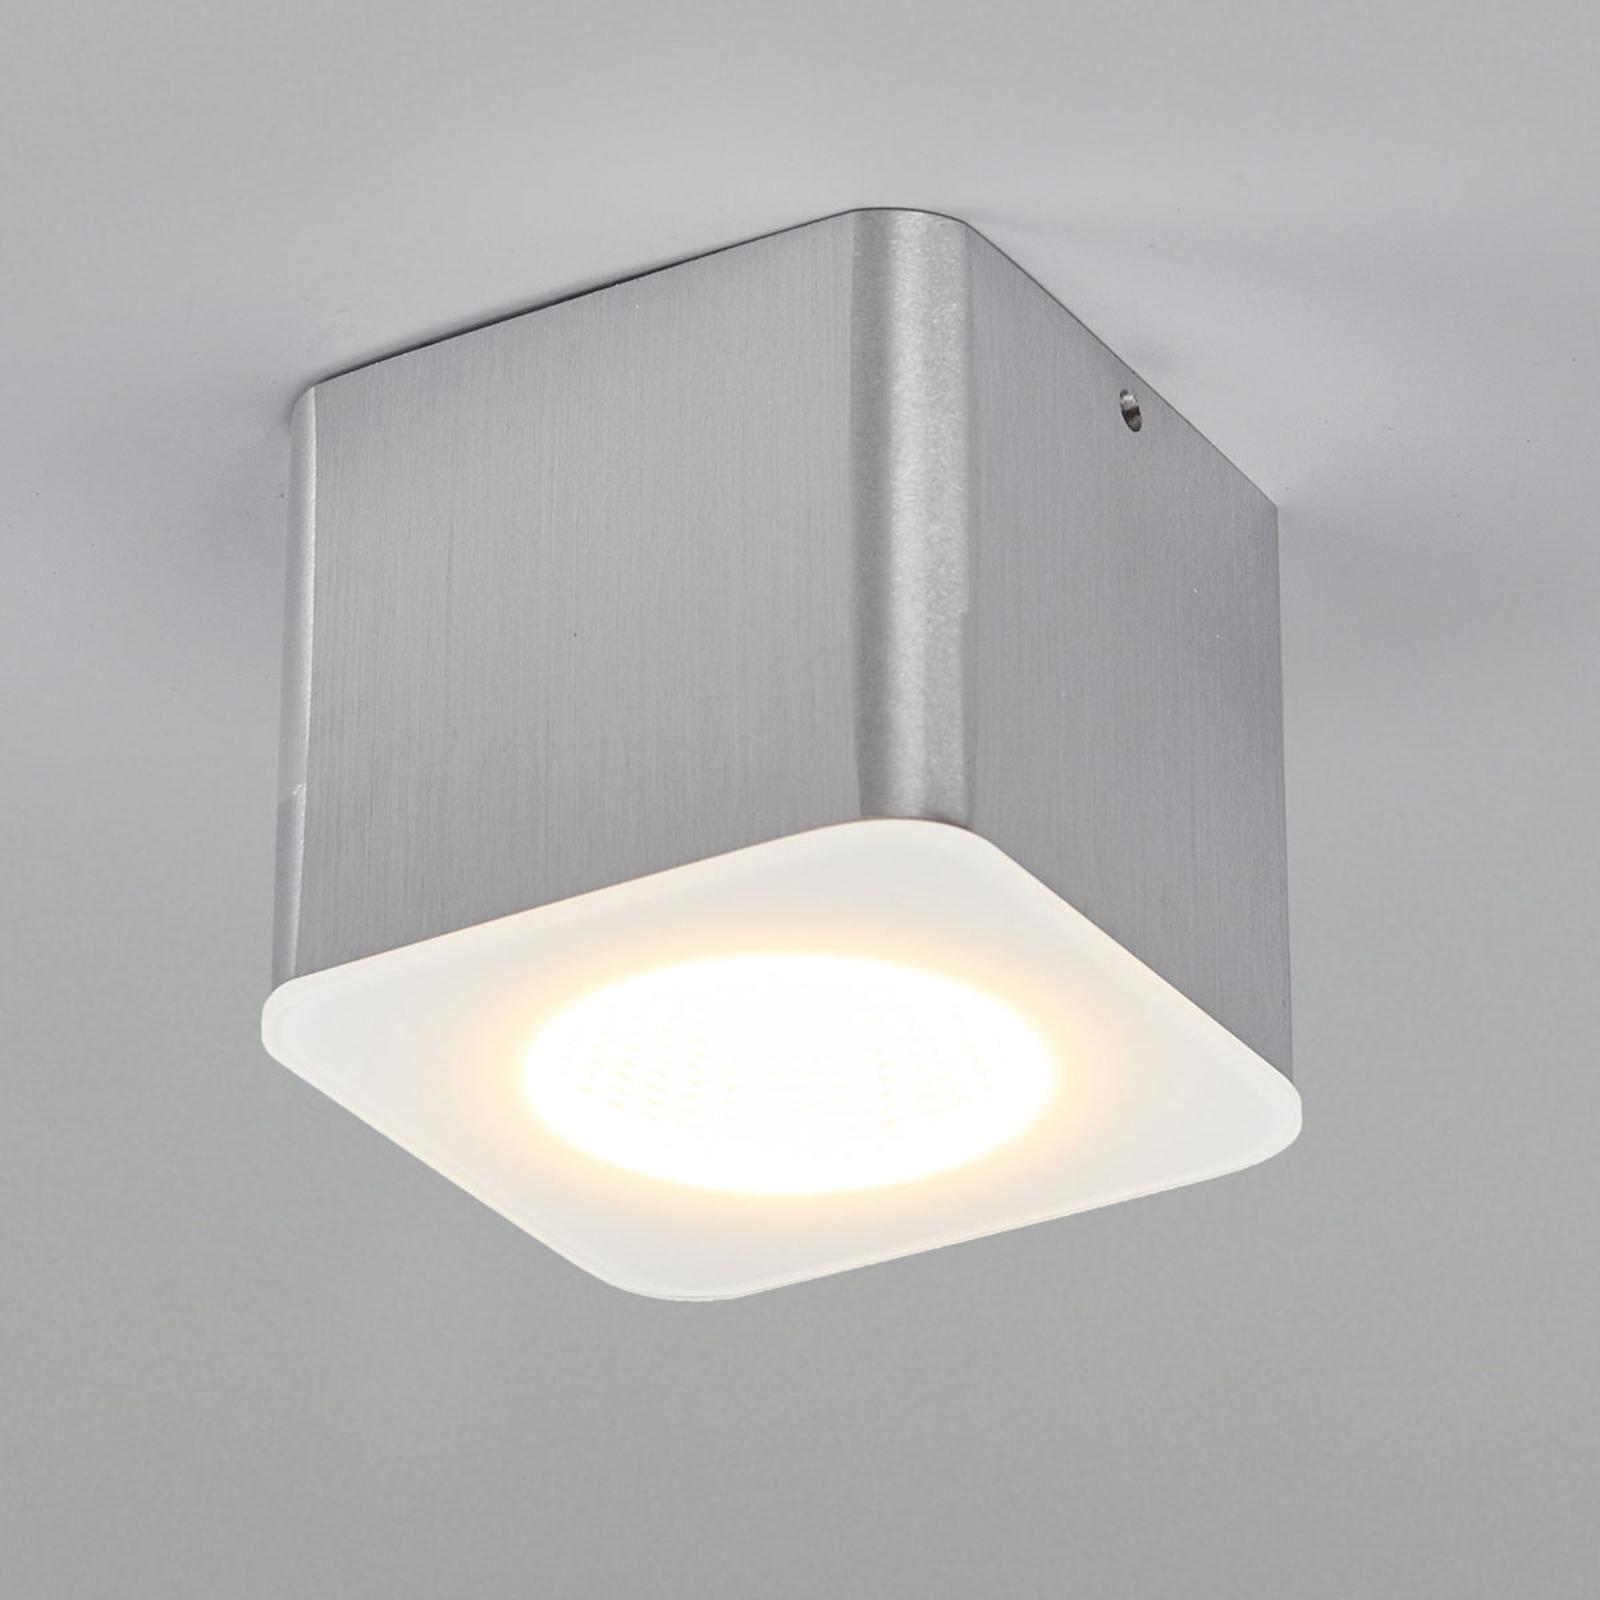 Helestra Oso LED-loftspot, kantet, mat alu